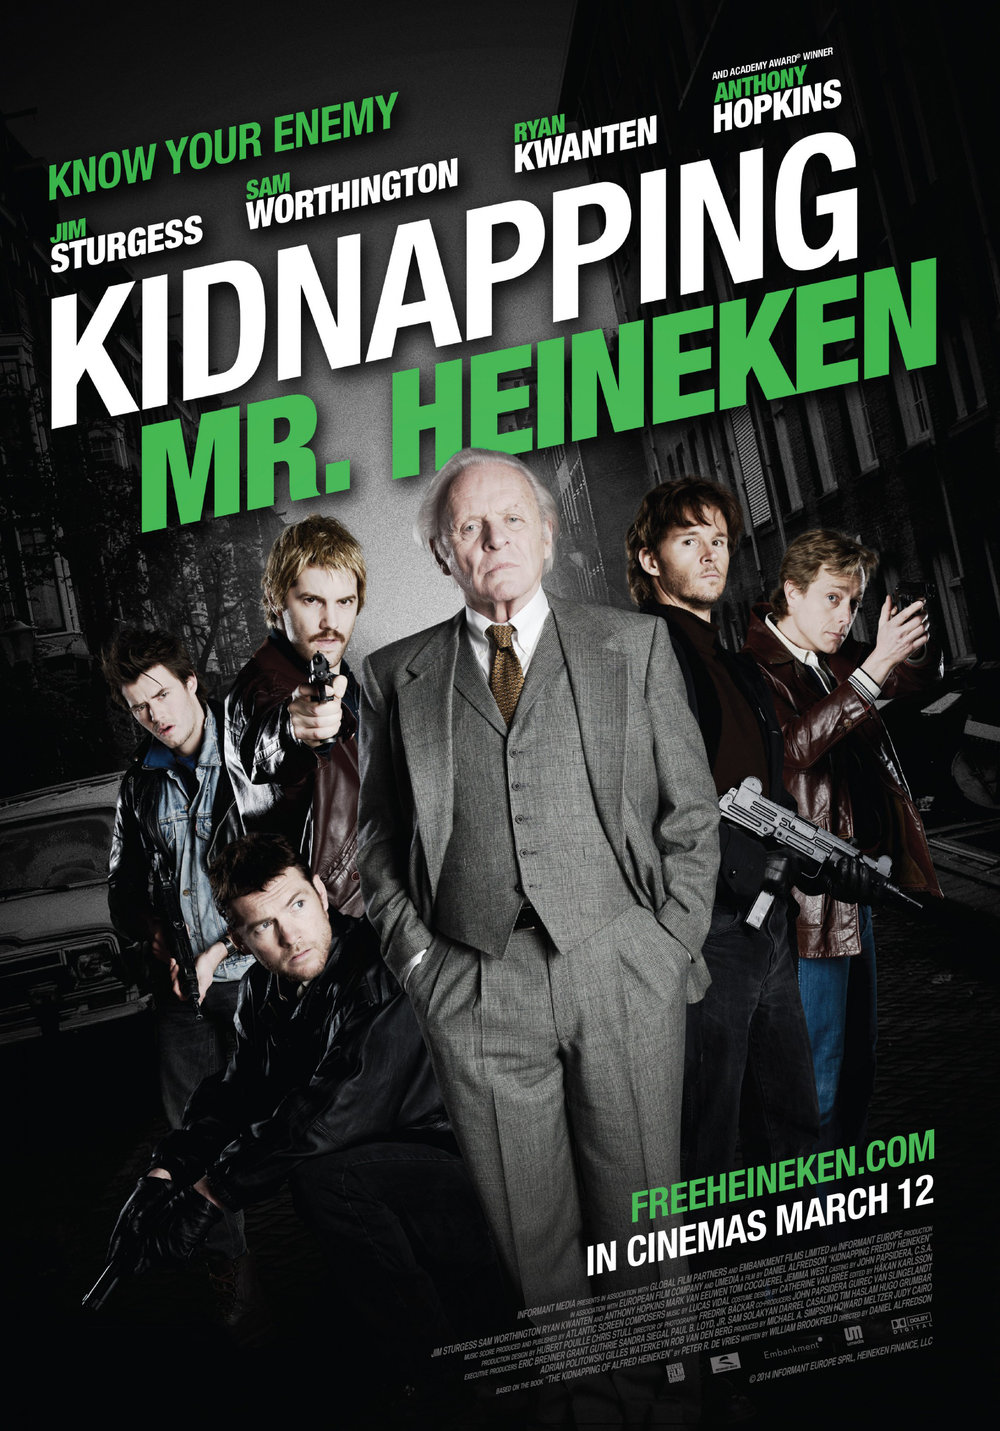 kidnapping_mr_heineken_ver2_xxlg+copy.jpg